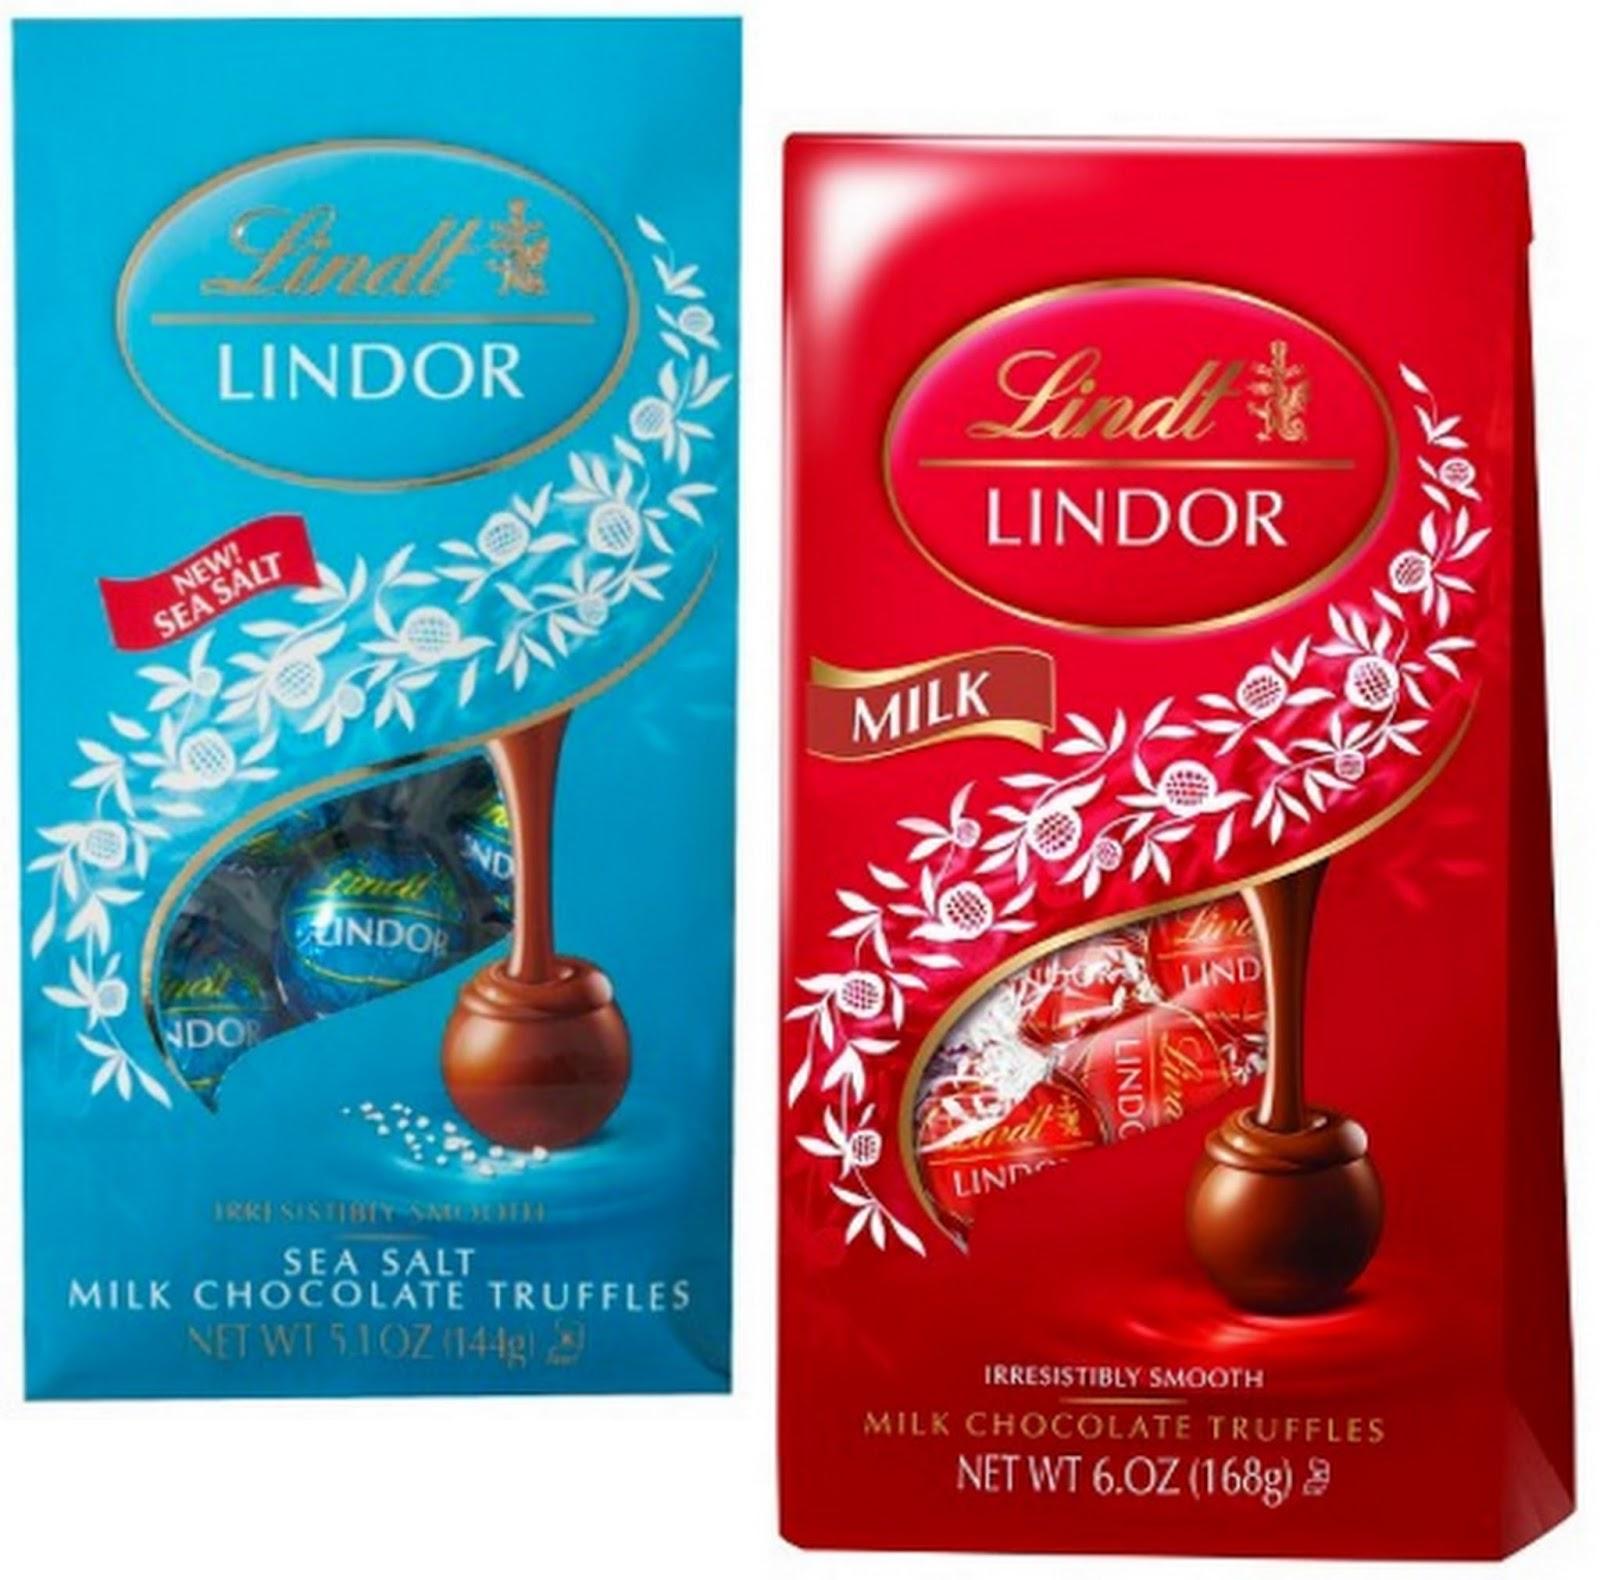 Lindor truffles coupons